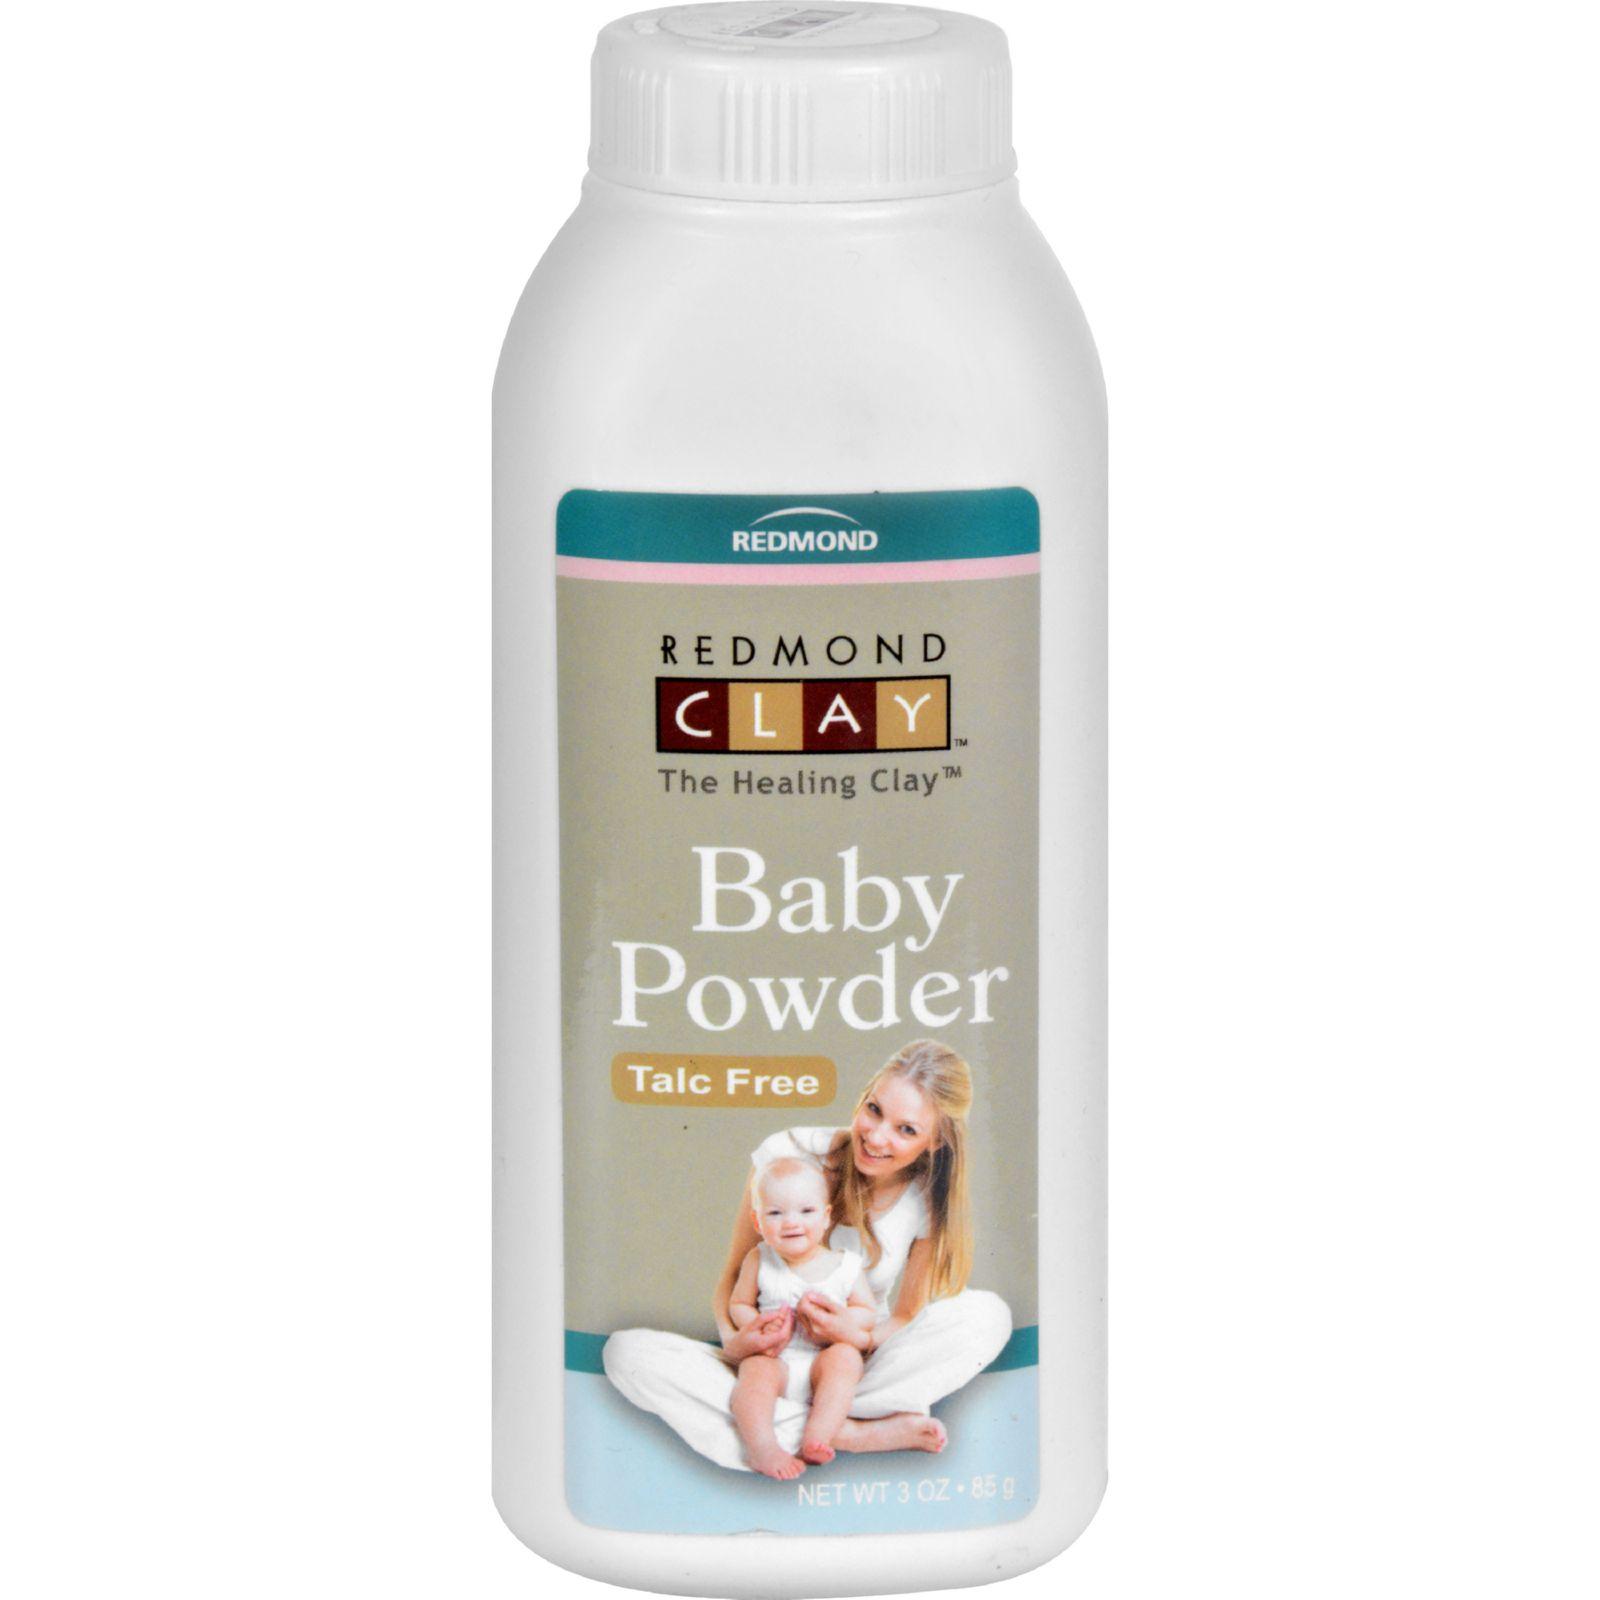 Baby Powder - 3 oz